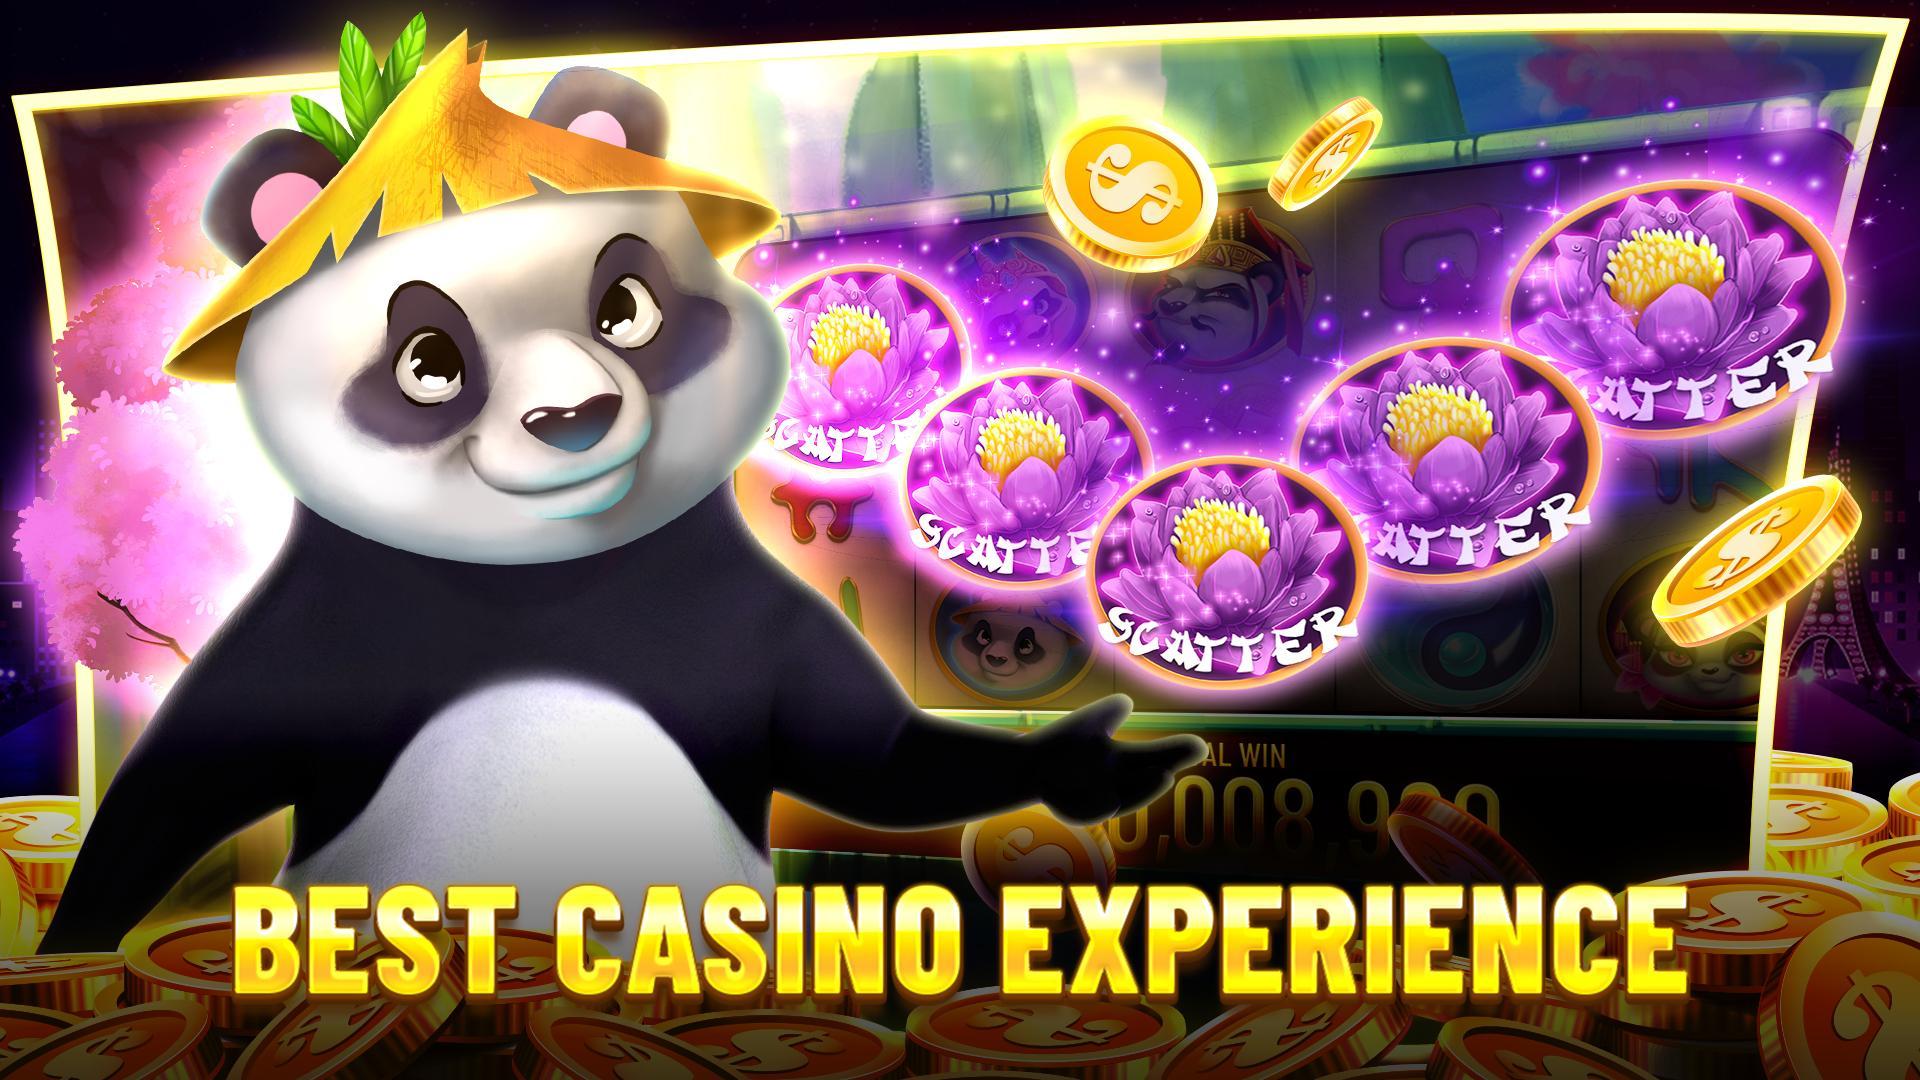 Best Casino Slots 777 Vegas Slots Games 4.5.8 Screenshot 9